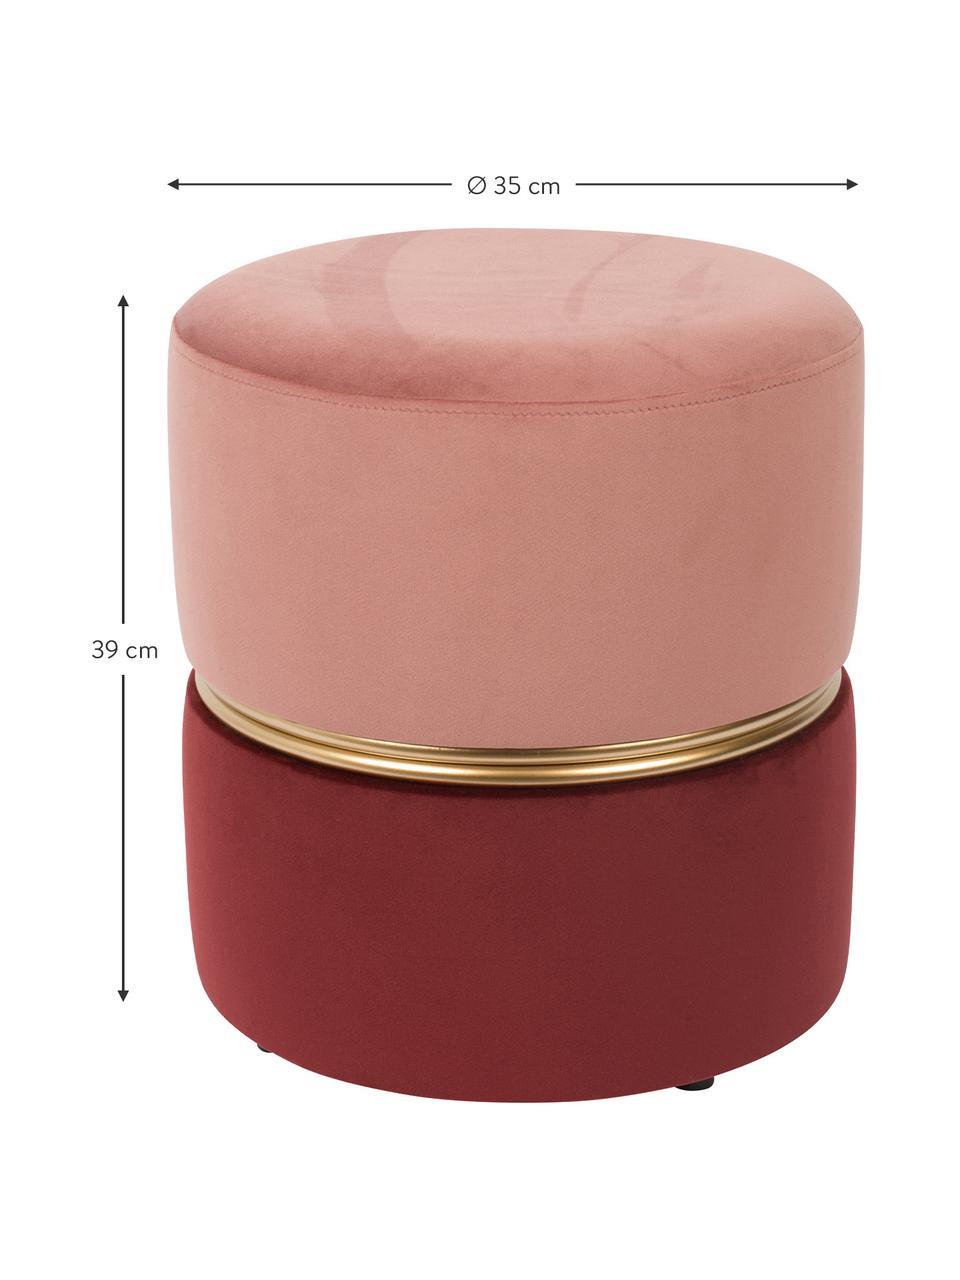 Fluwelen poef Bubbly, Bekleding: polyesterfluweel, Frame: MDF, grenenhout, Roze, robijnrood, Ø 35 x H 39 cm